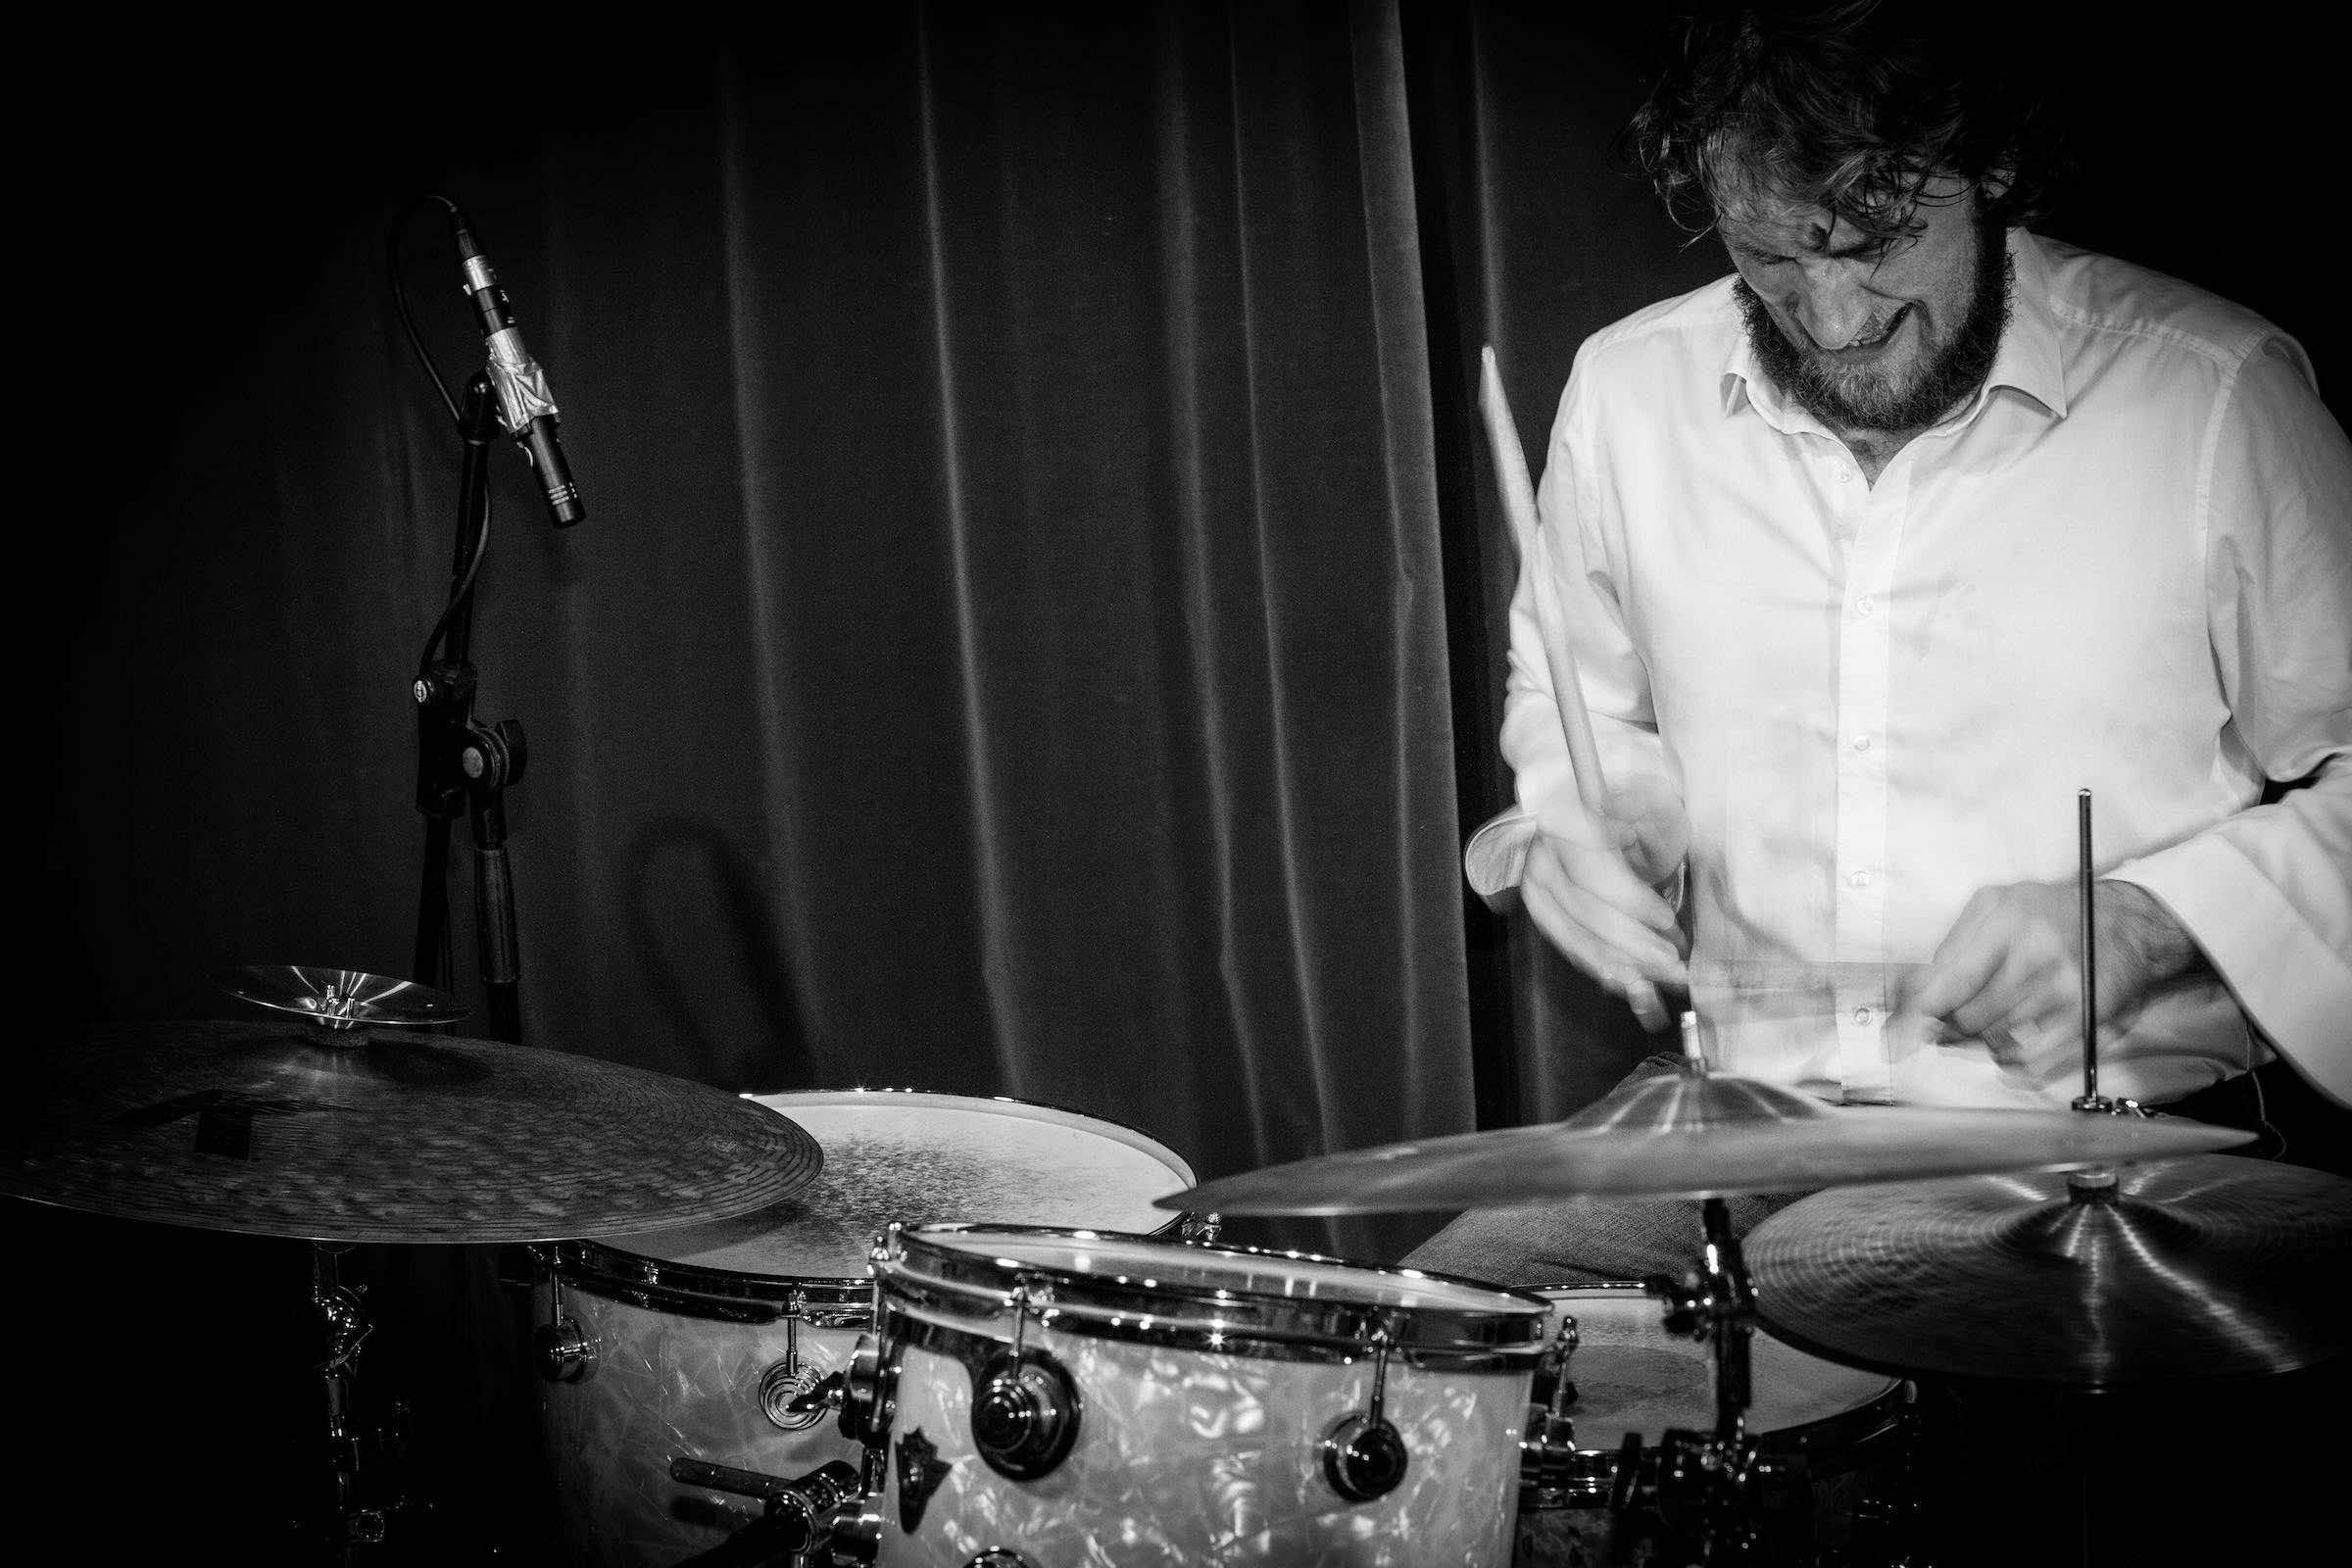 Band | Hamburg | Liveband | Livemusik | Walking | Act | Partyband | Popband | Jazzband | Swingband | Messeparty | Lounge | Soul | Popmusik | Jazz | Schlagzeug | Drummer | Drums | Hochzeit | Firmenfeier | Charity | Gala | Hamburgfeiert